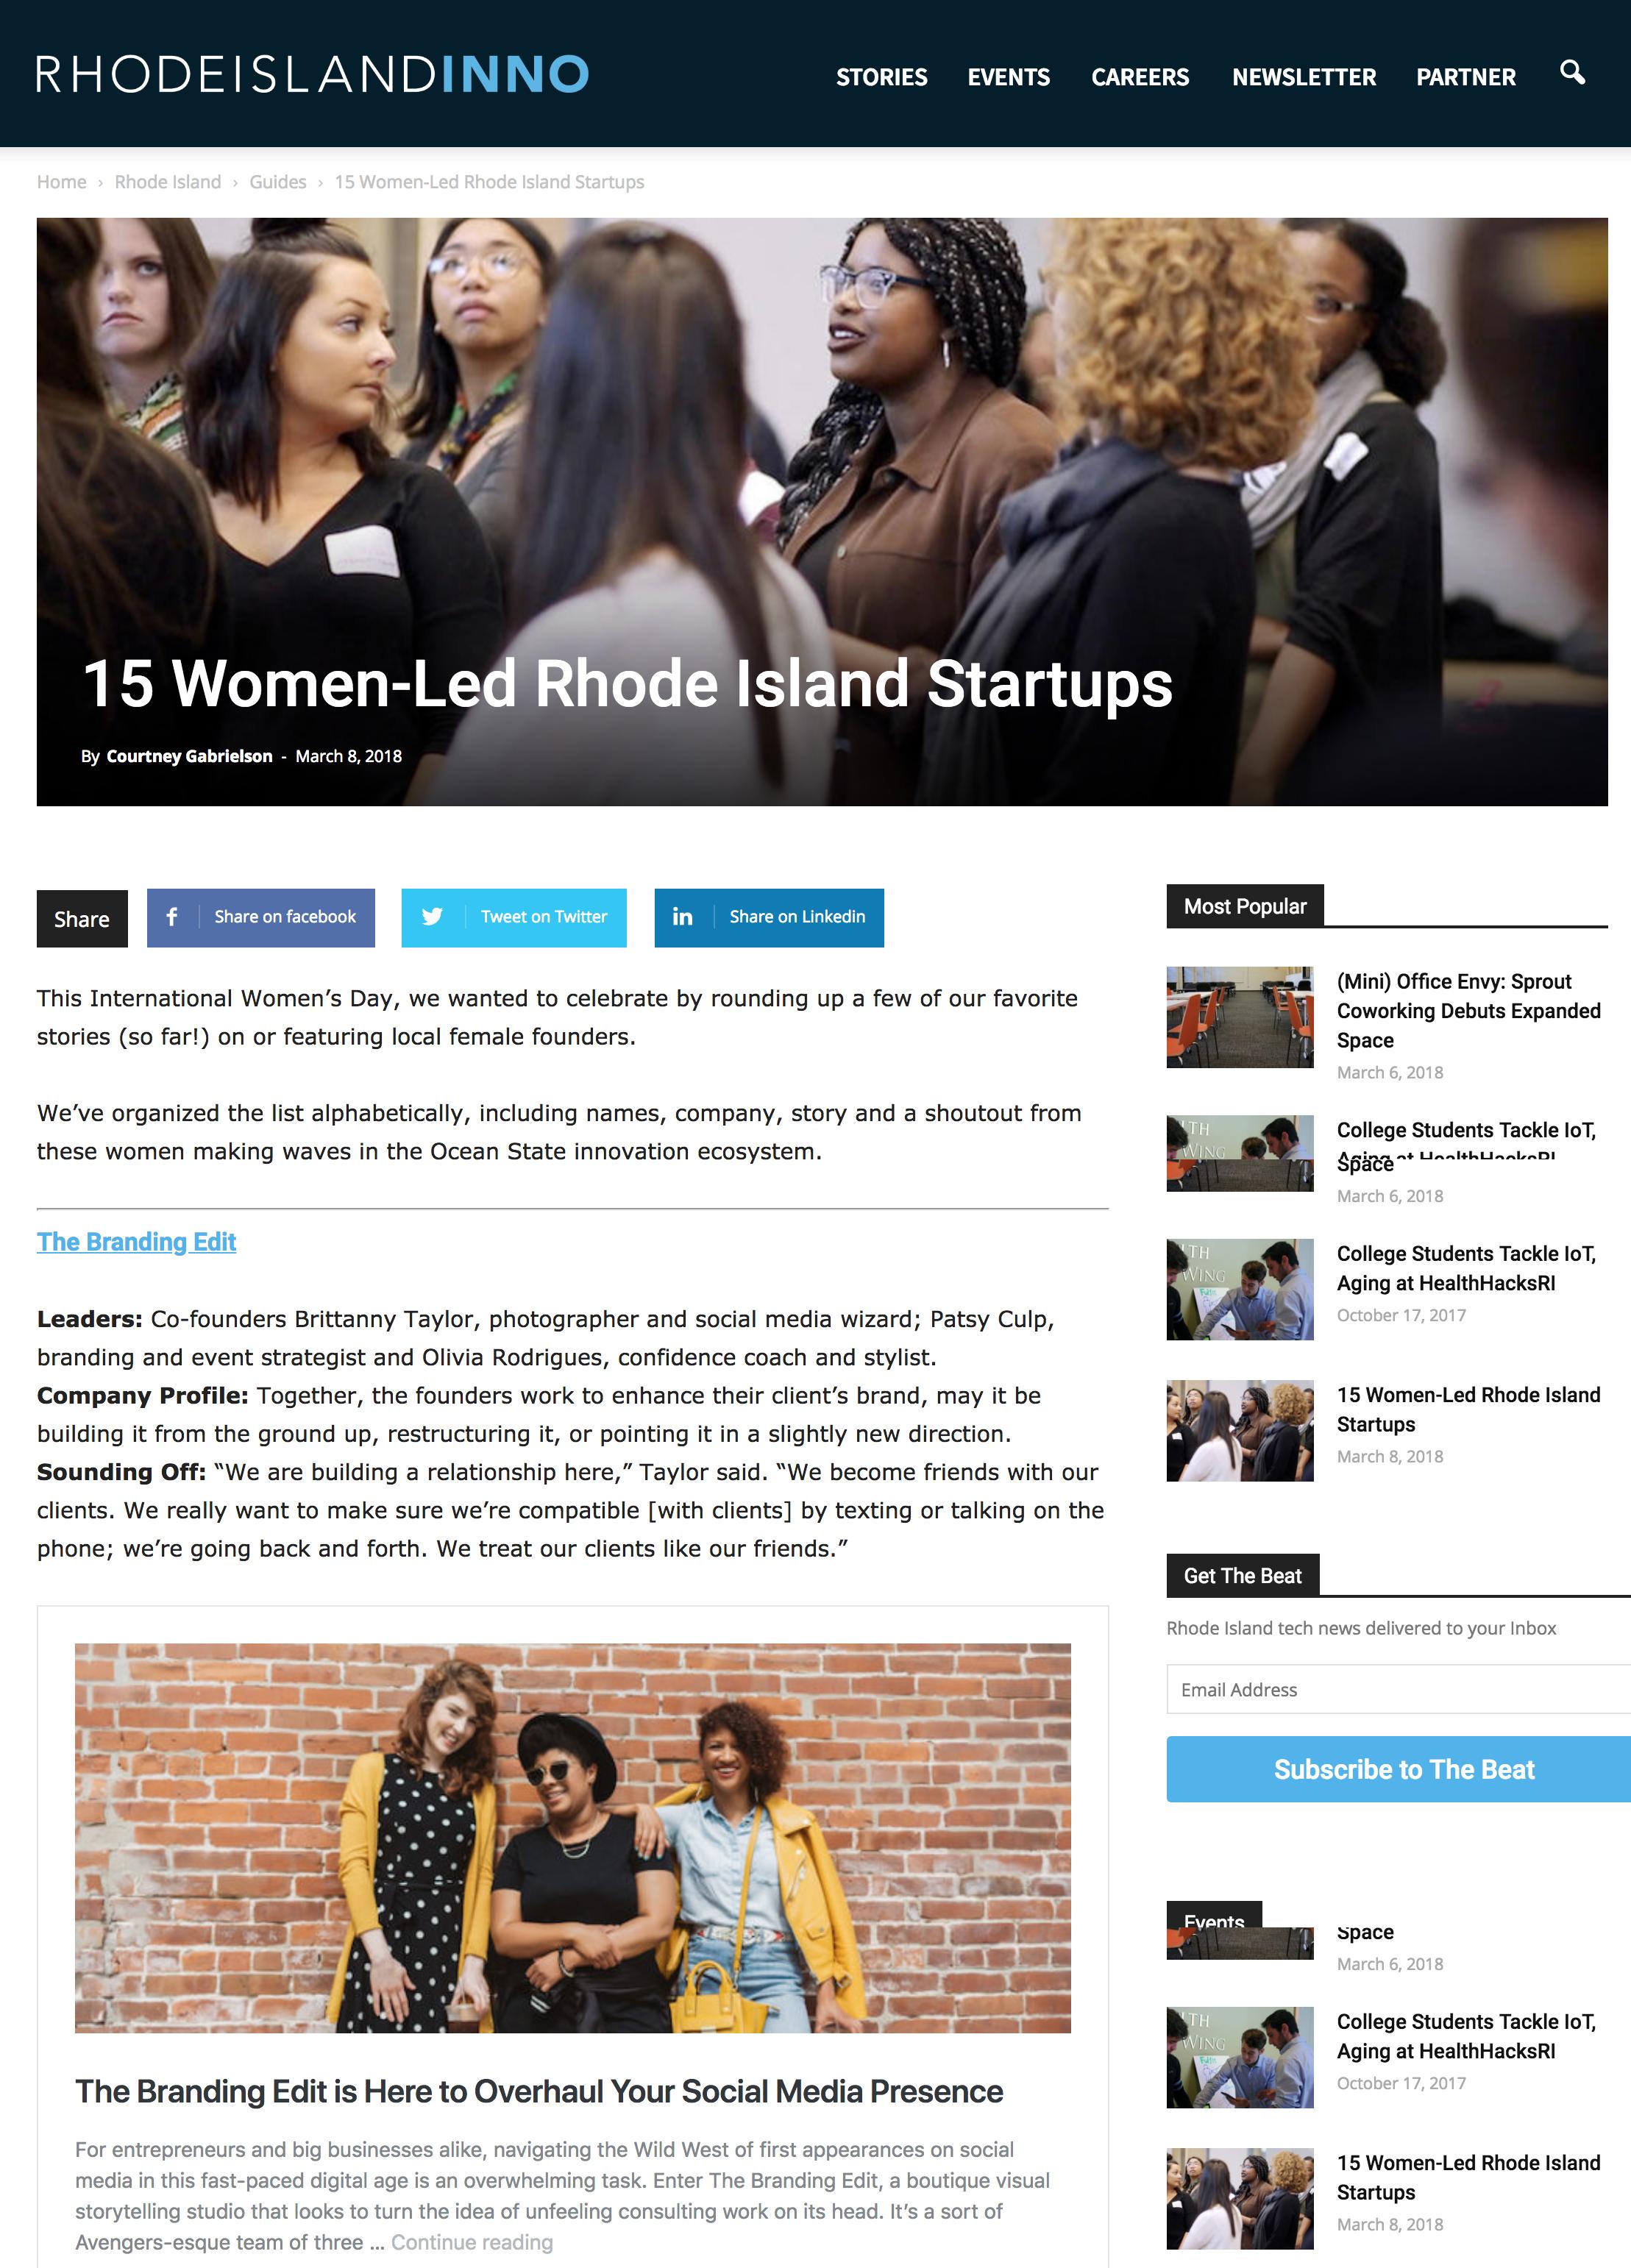 screencapture-americaninno-rhodeisland-guides-rhodeisland-15-women-led-rhode-island-startups-2018-03-13-10_28_50 copy.png